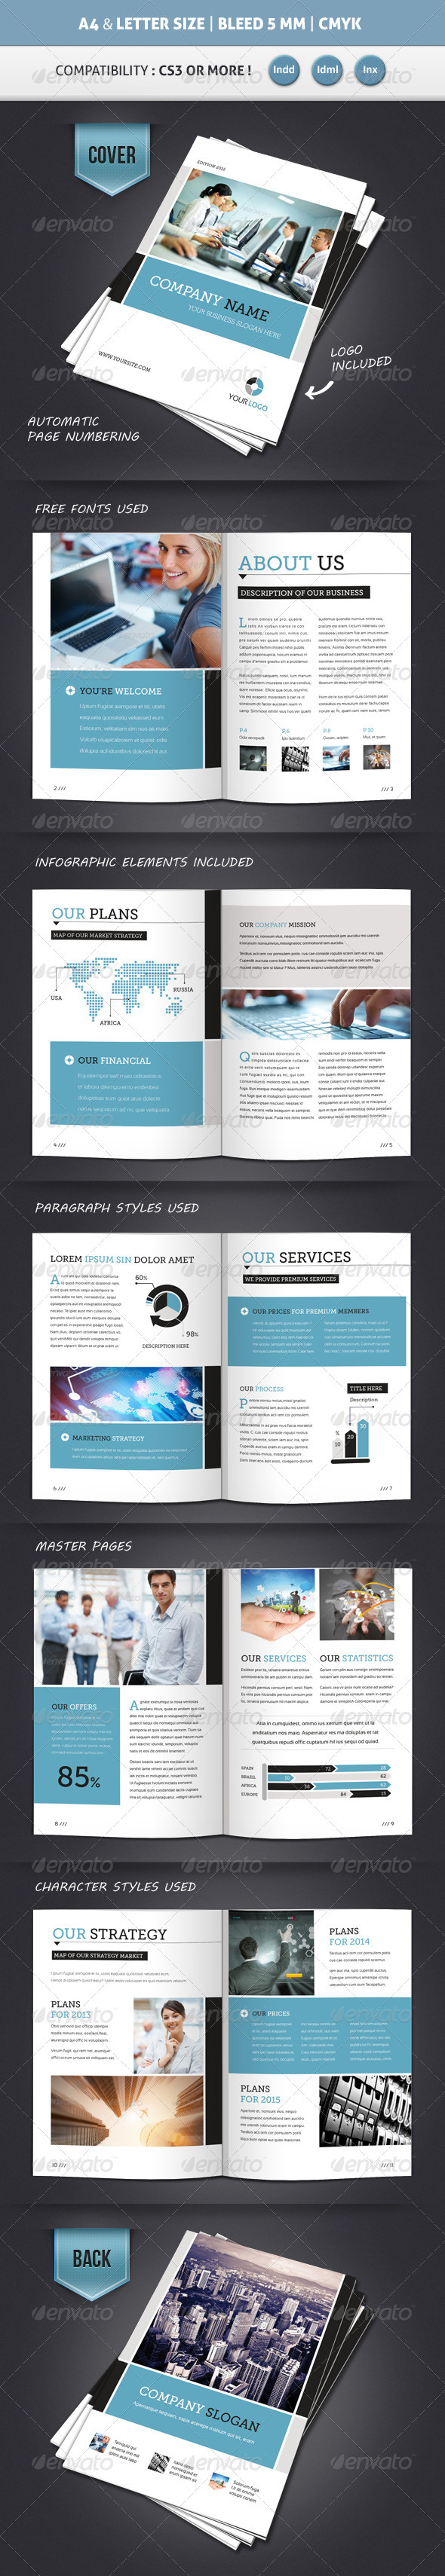 sales brochures templates - Goal.goodwinmetals.co